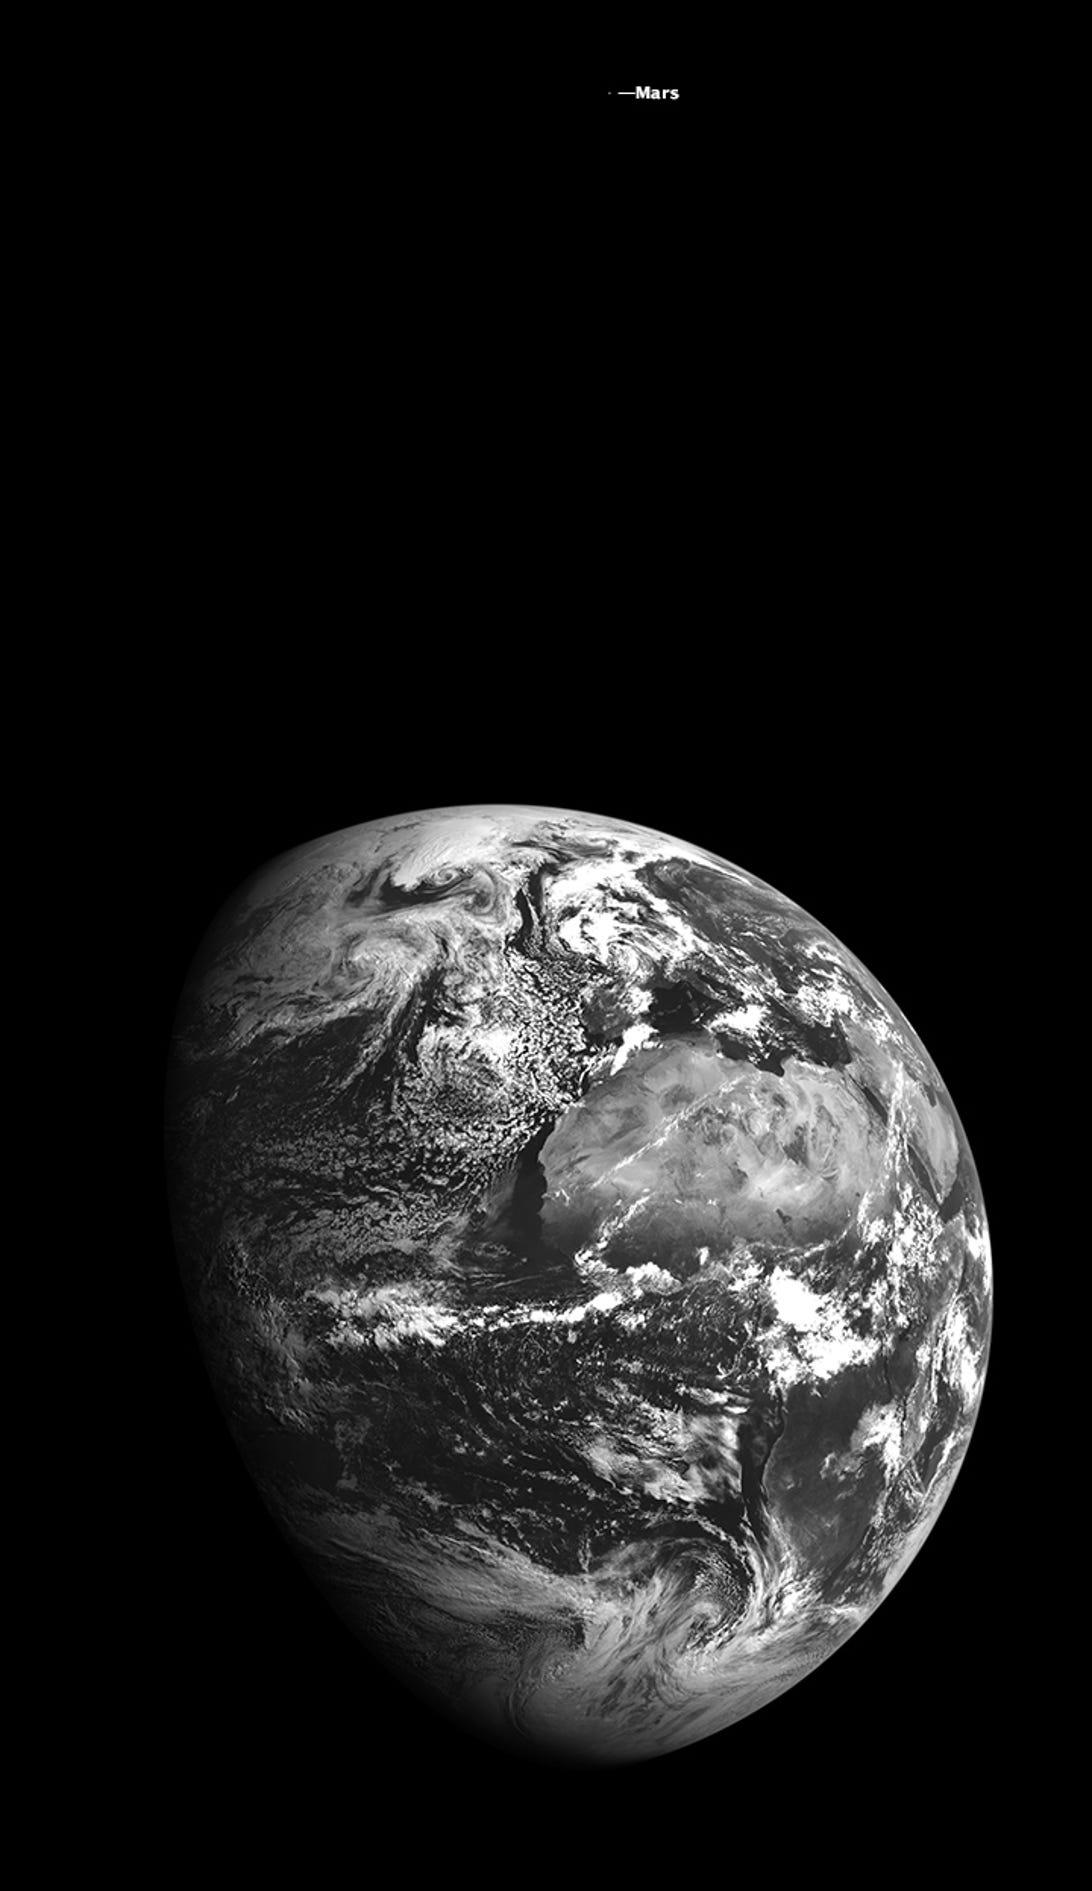 earthmarsbrighte1155564561.jpg